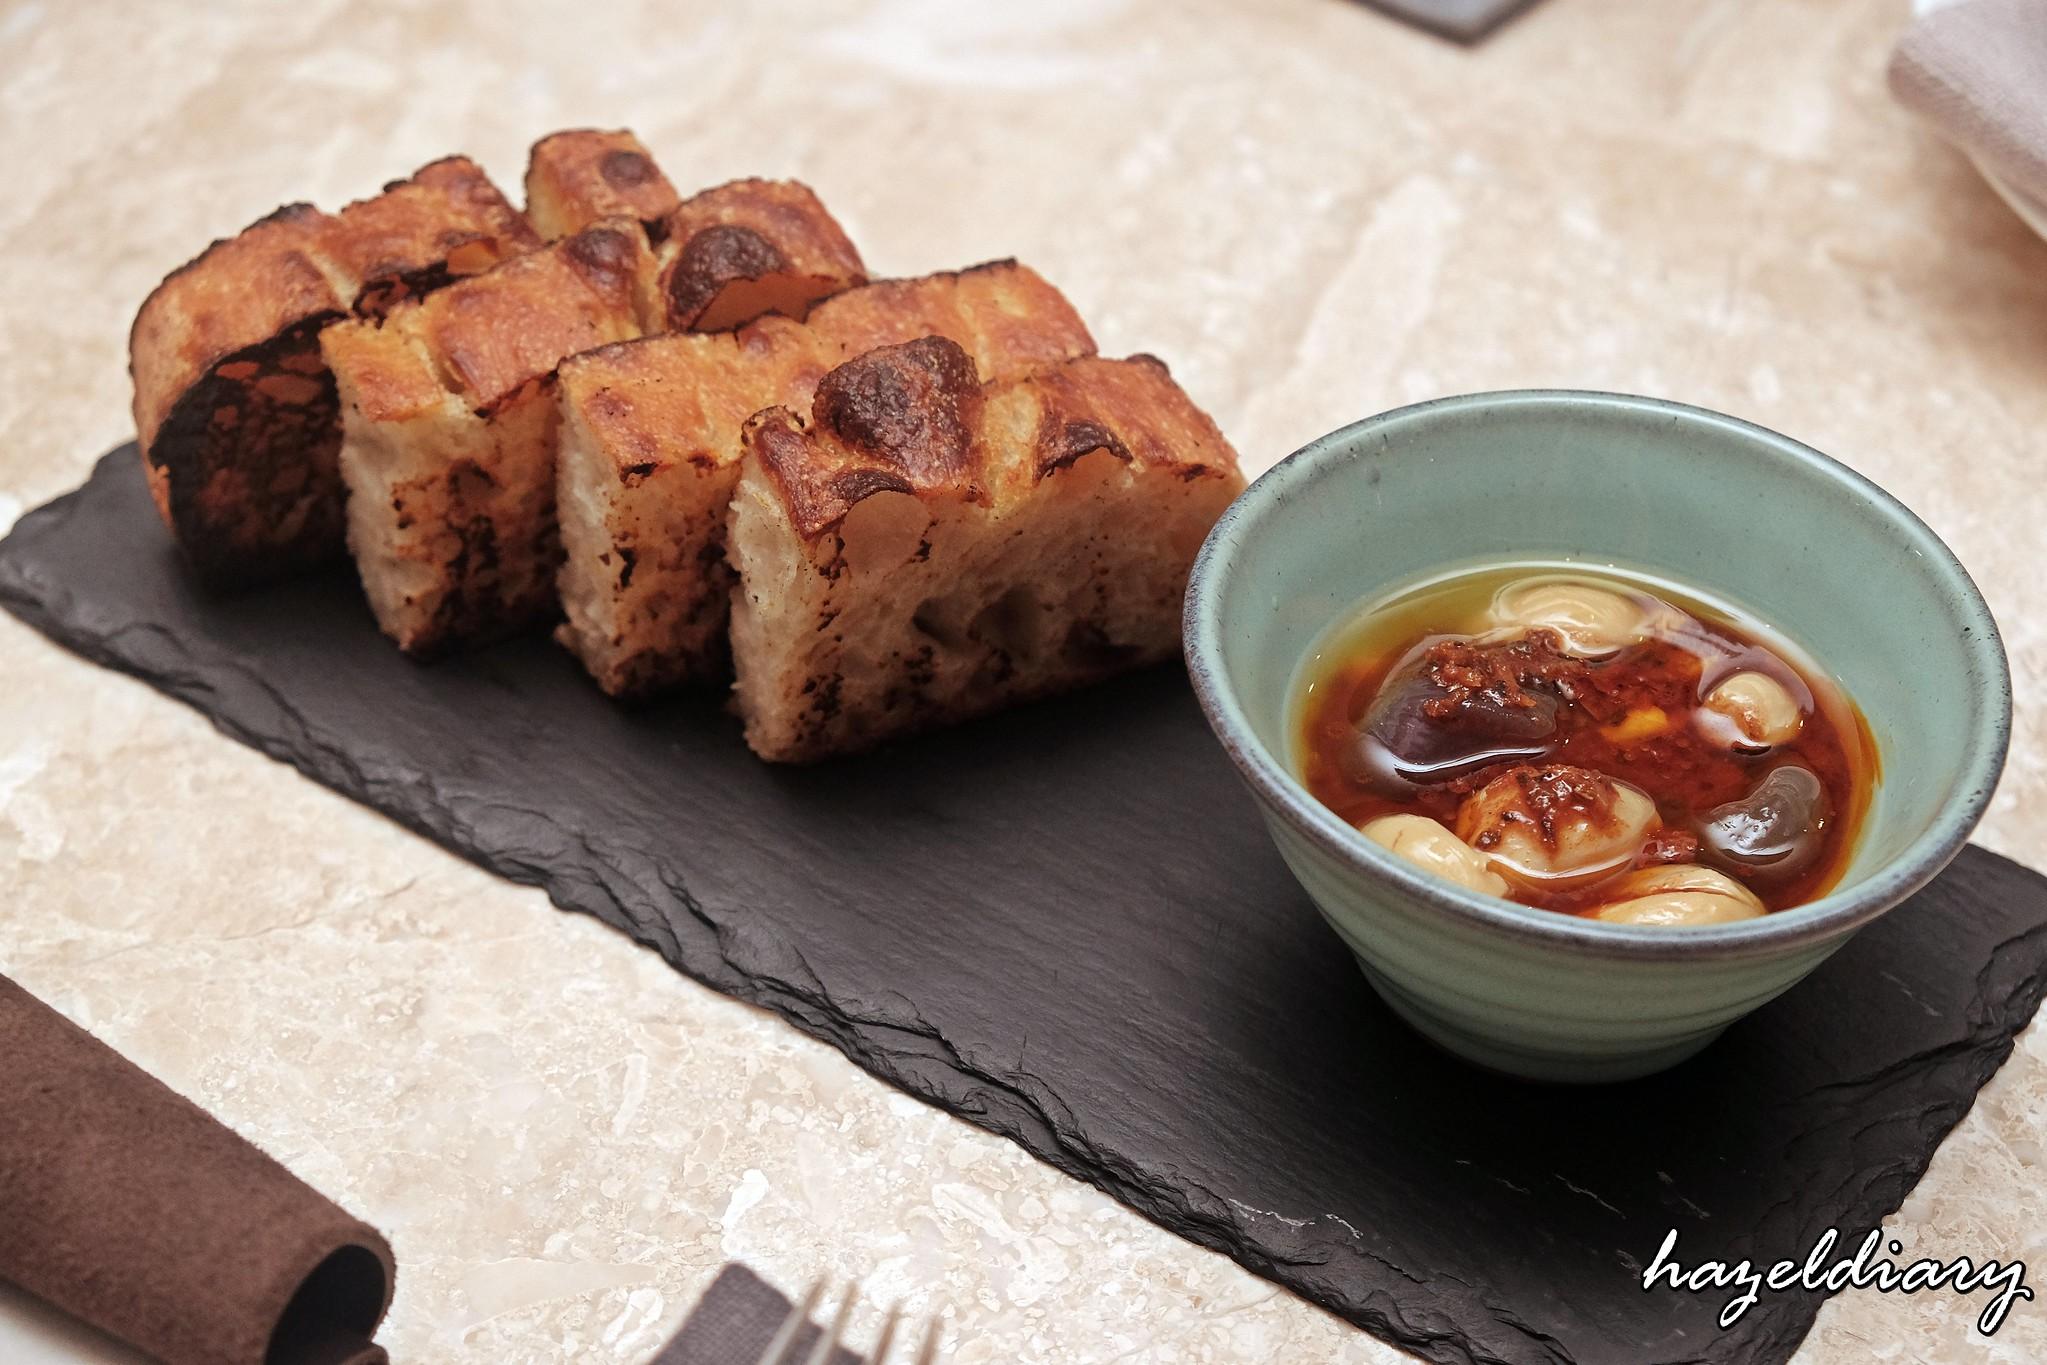 Kilo Kitchen Duxton Road-Pan grilled bread